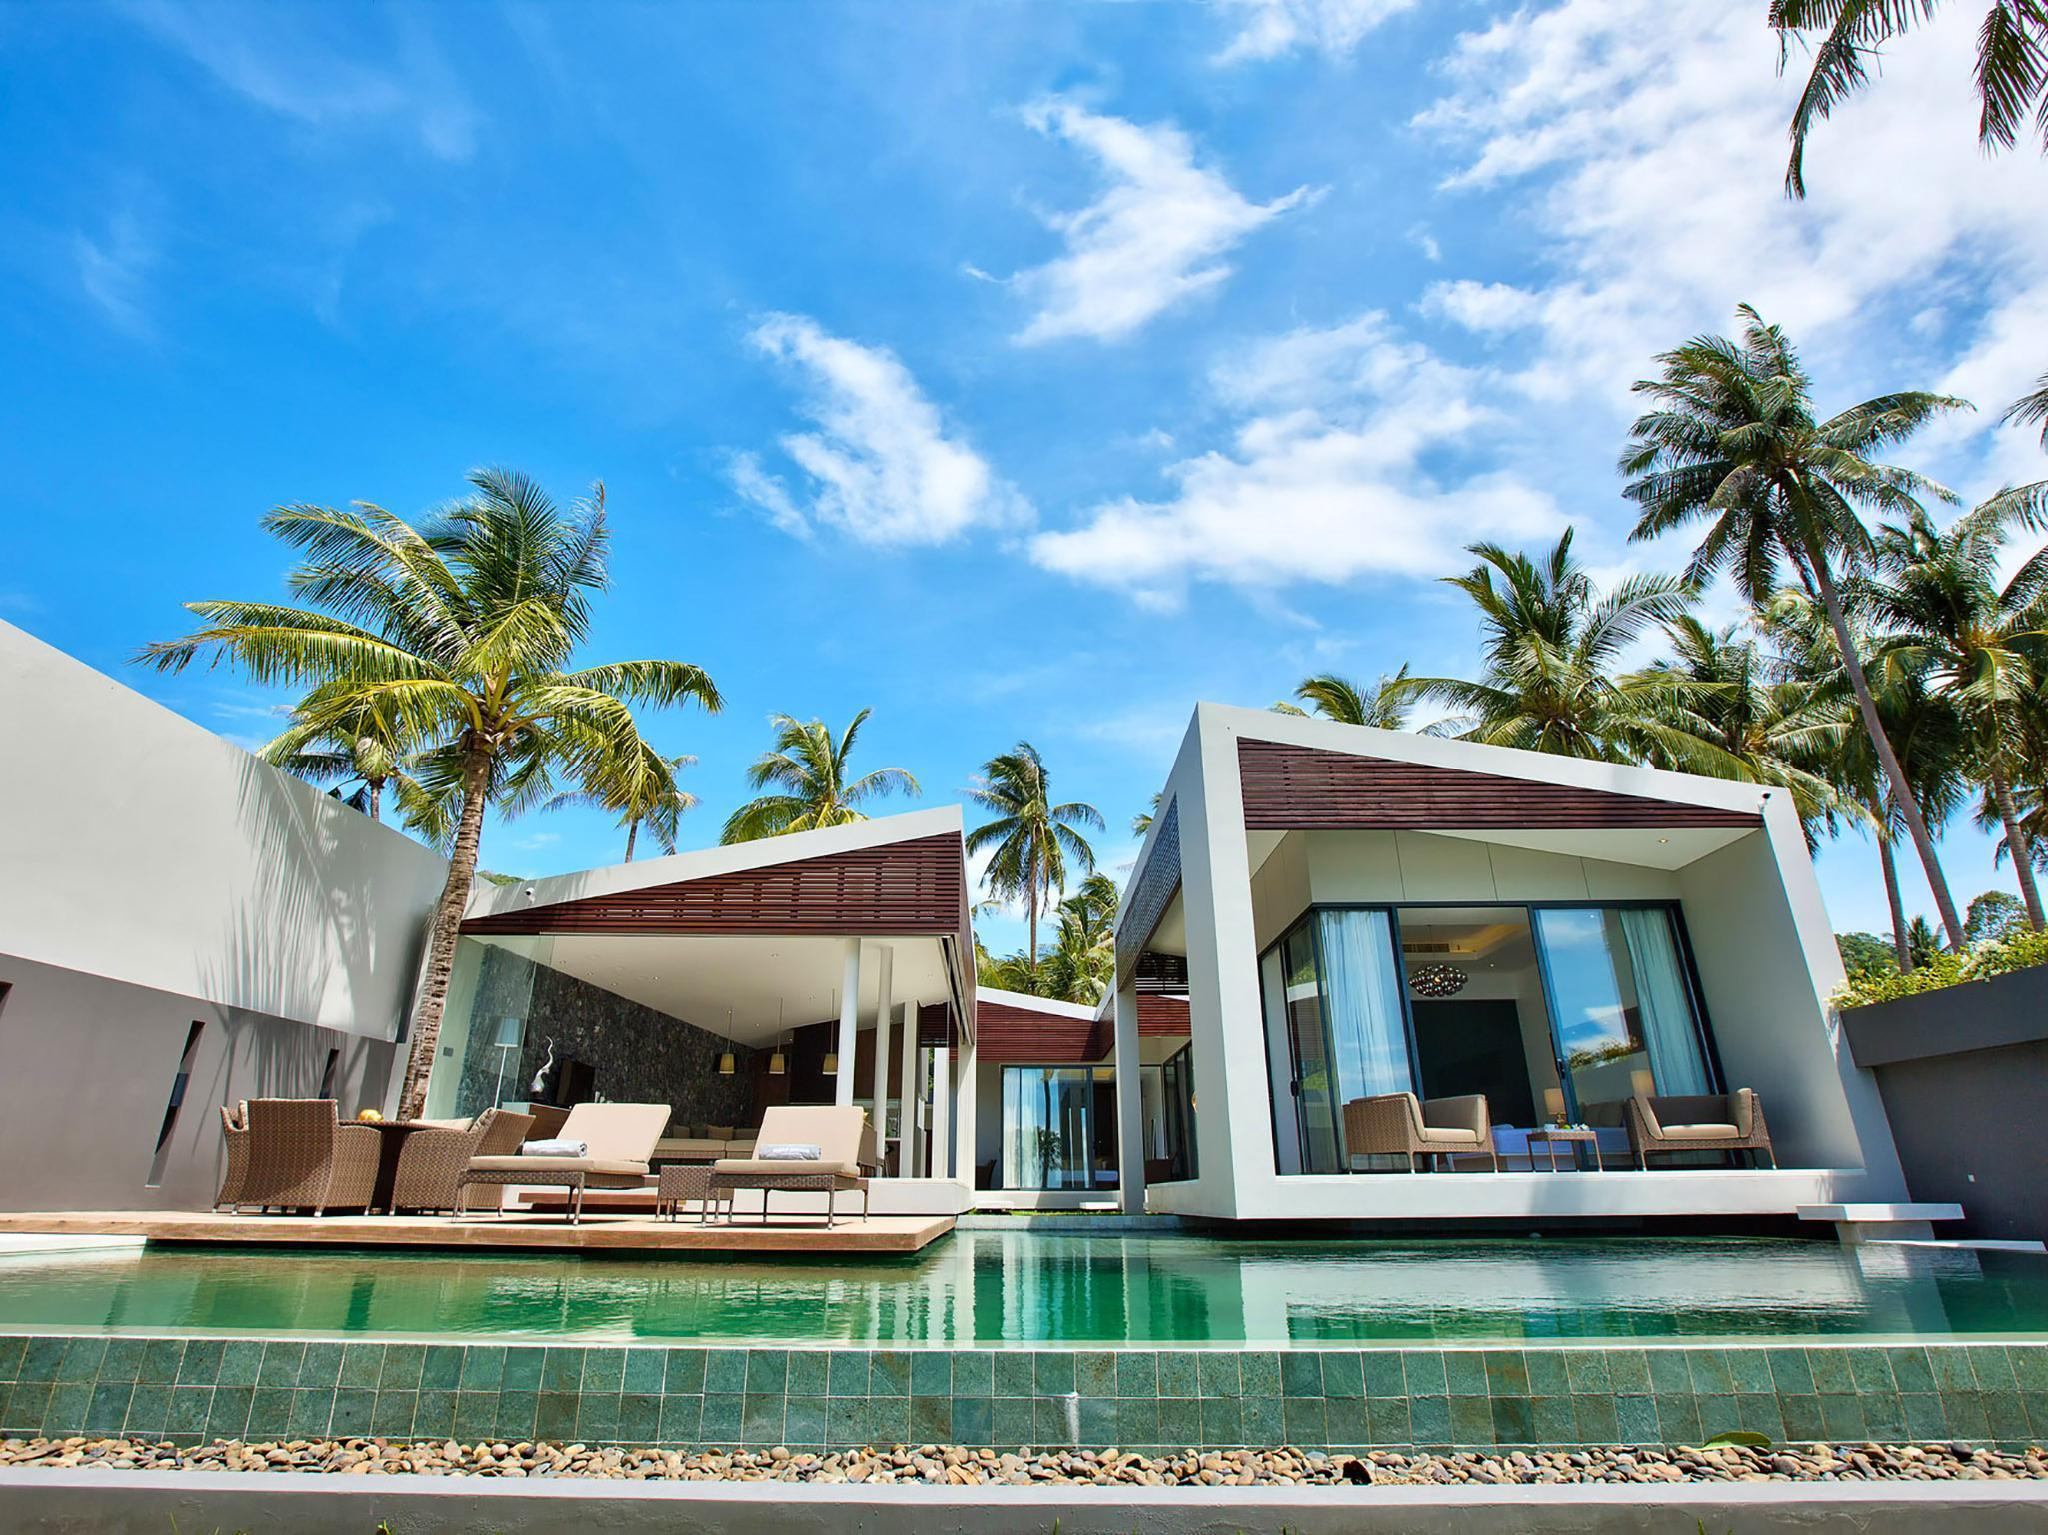 Mandalay Beach Villas - an elite haven มัณฑะเลย์ บีช วิลลา